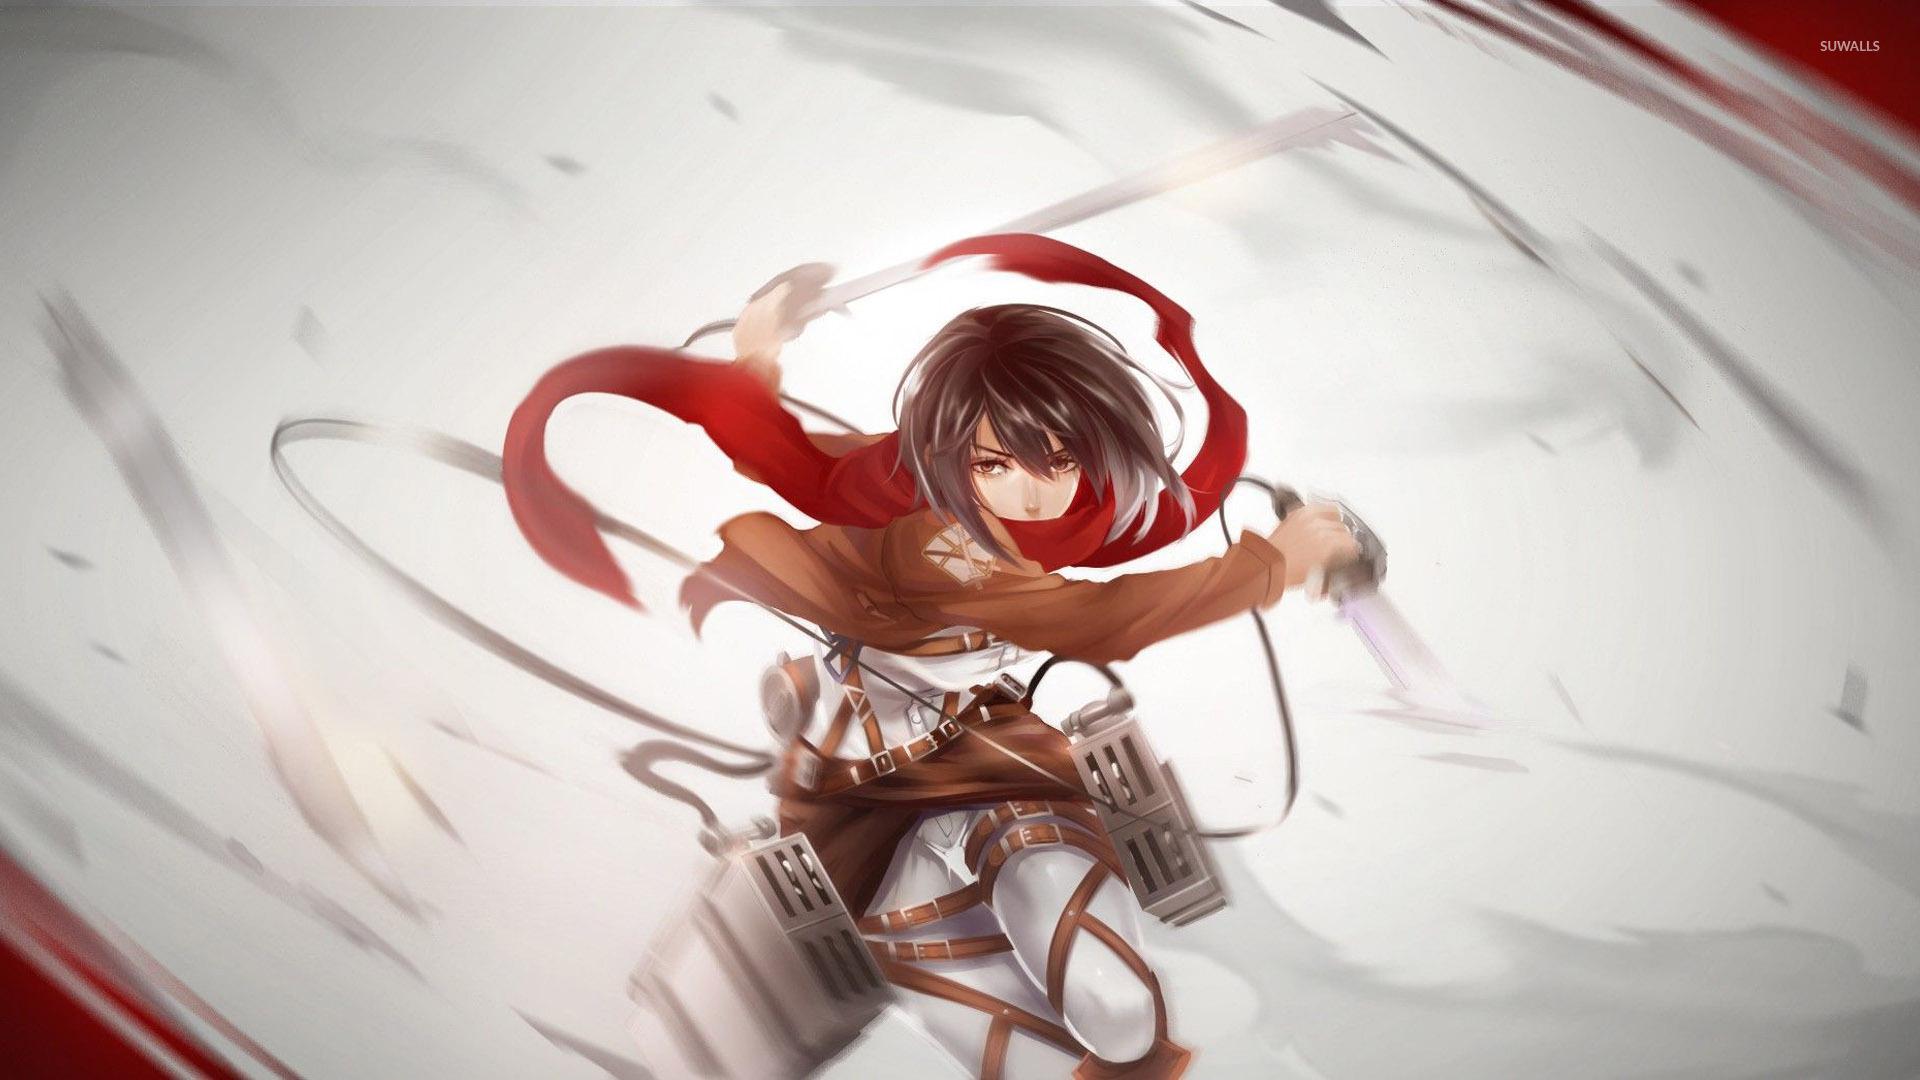 Mikasa ackerman attack on titan wallpaper anime wallpapers mikasa ackerman attack on titan wallpaper voltagebd Image collections